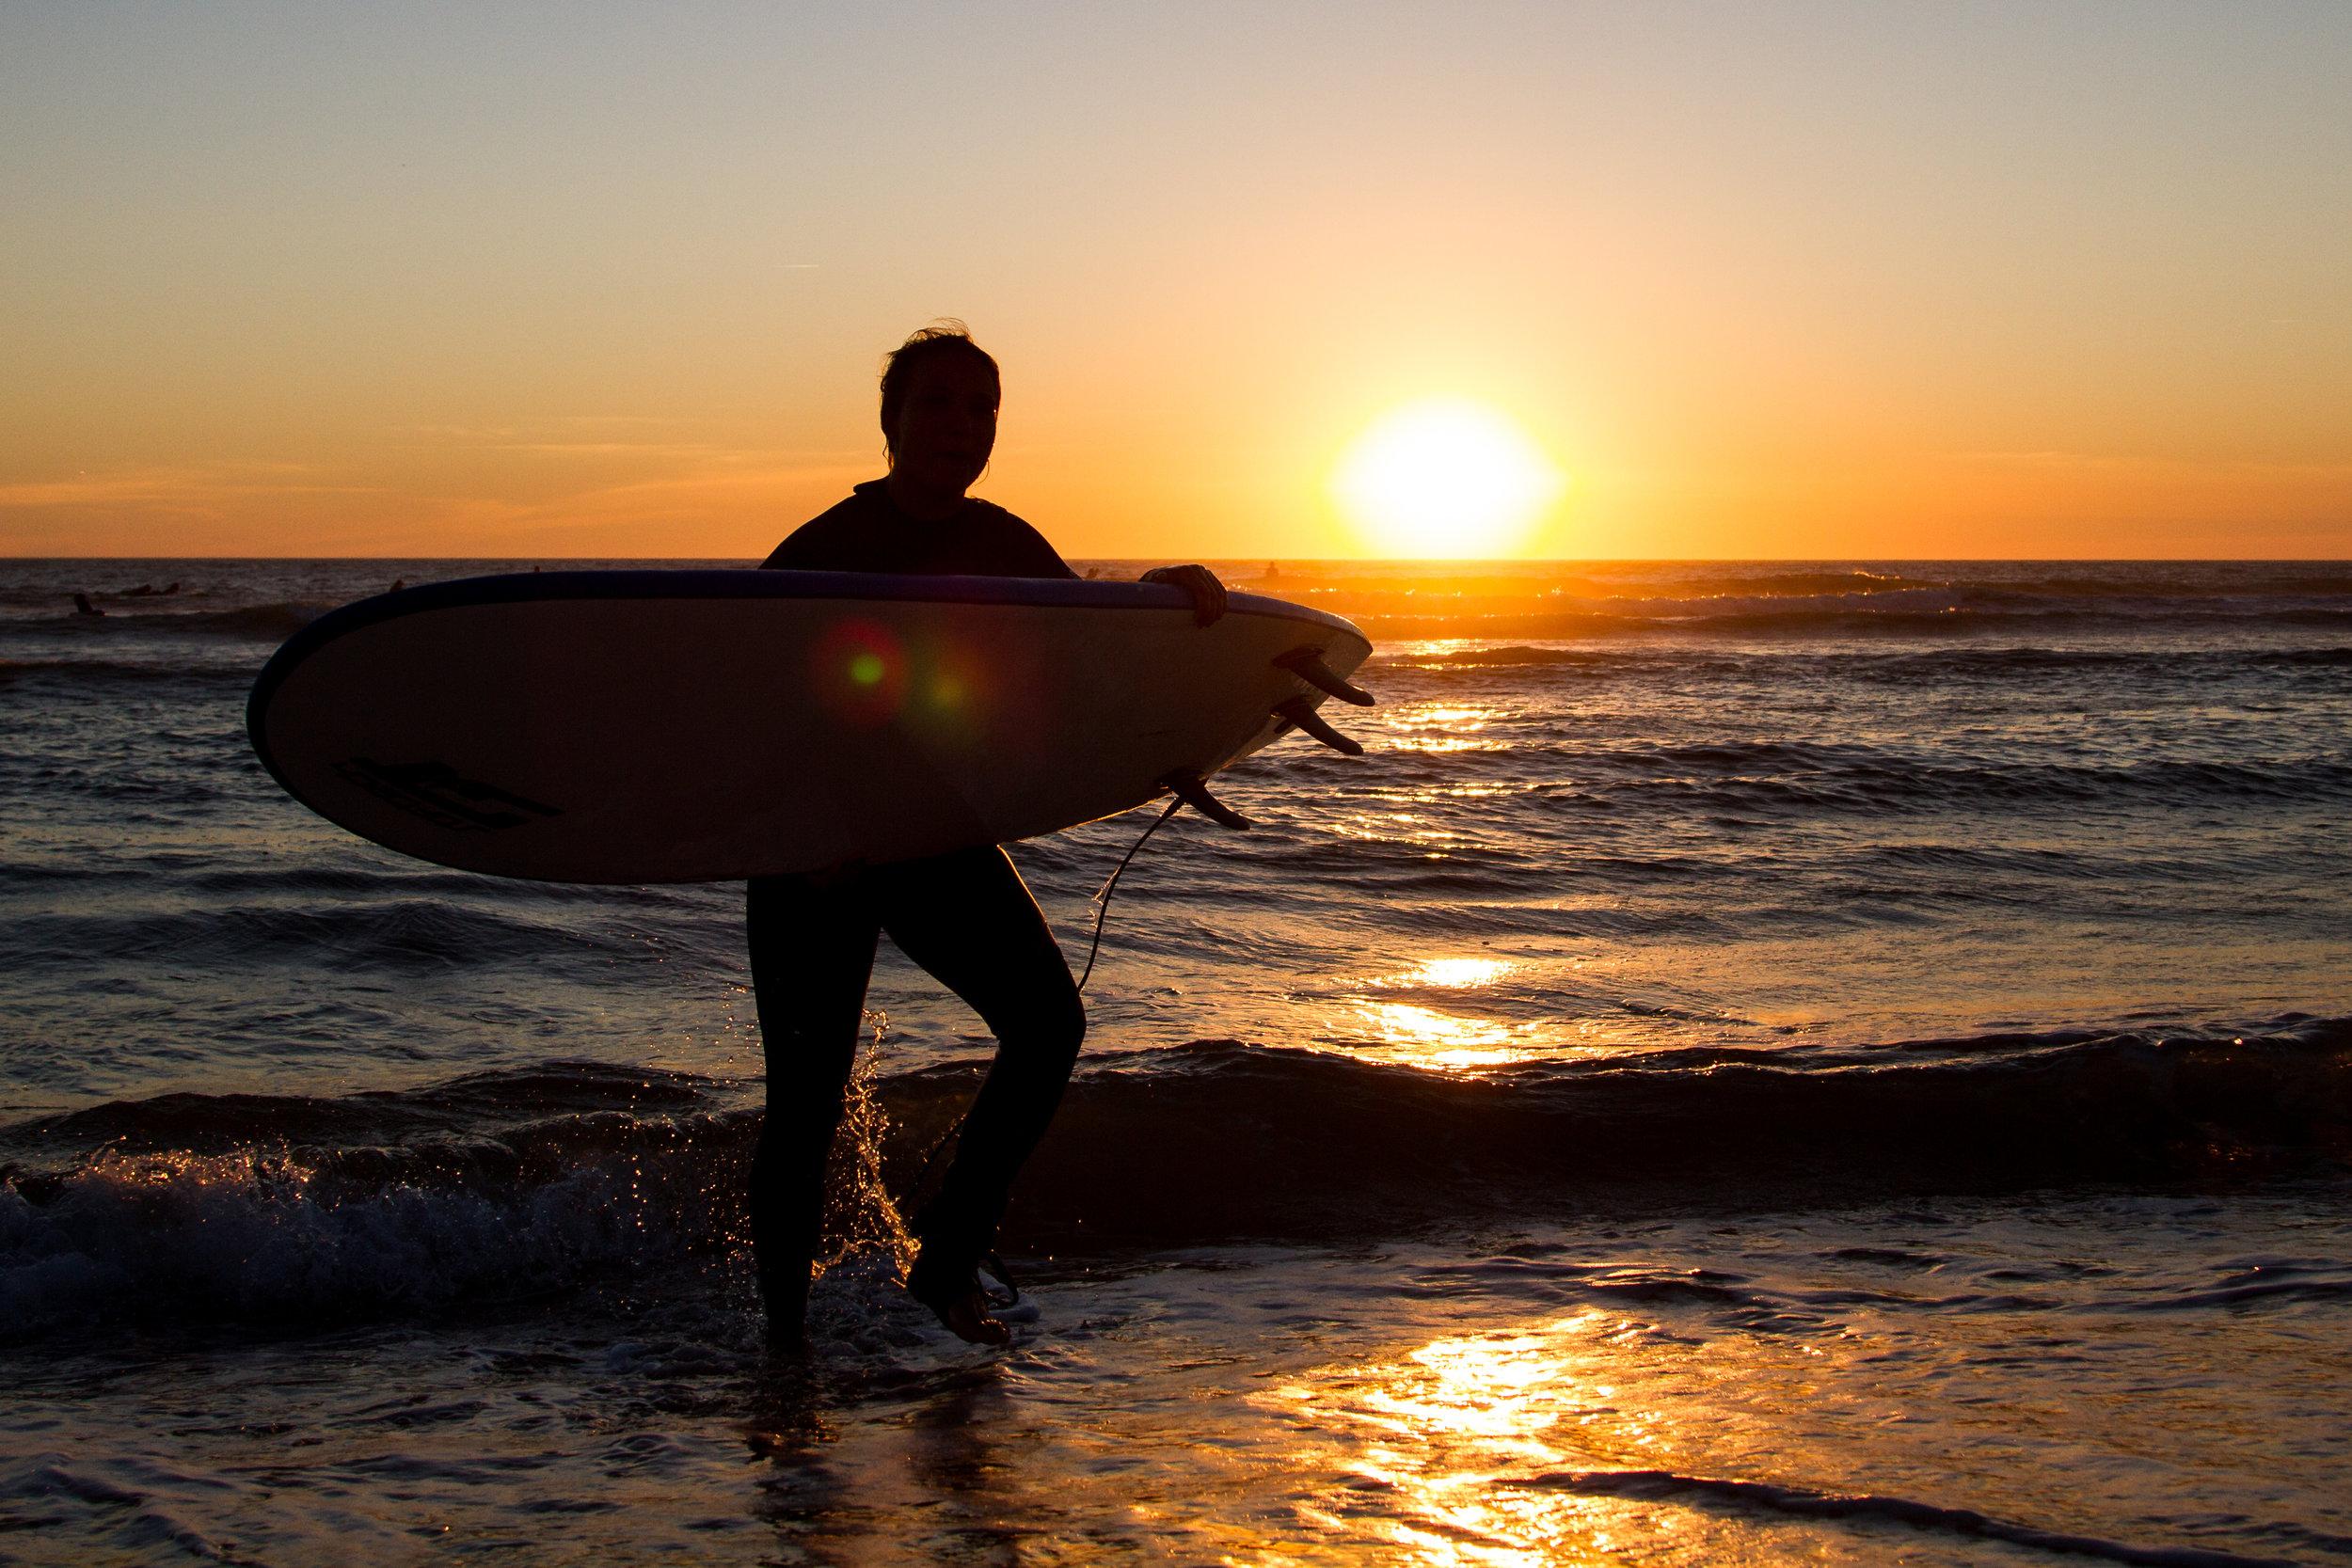 Schickhardt SurfcampSchickhardt, Surfcamp, 2015, Summersurf